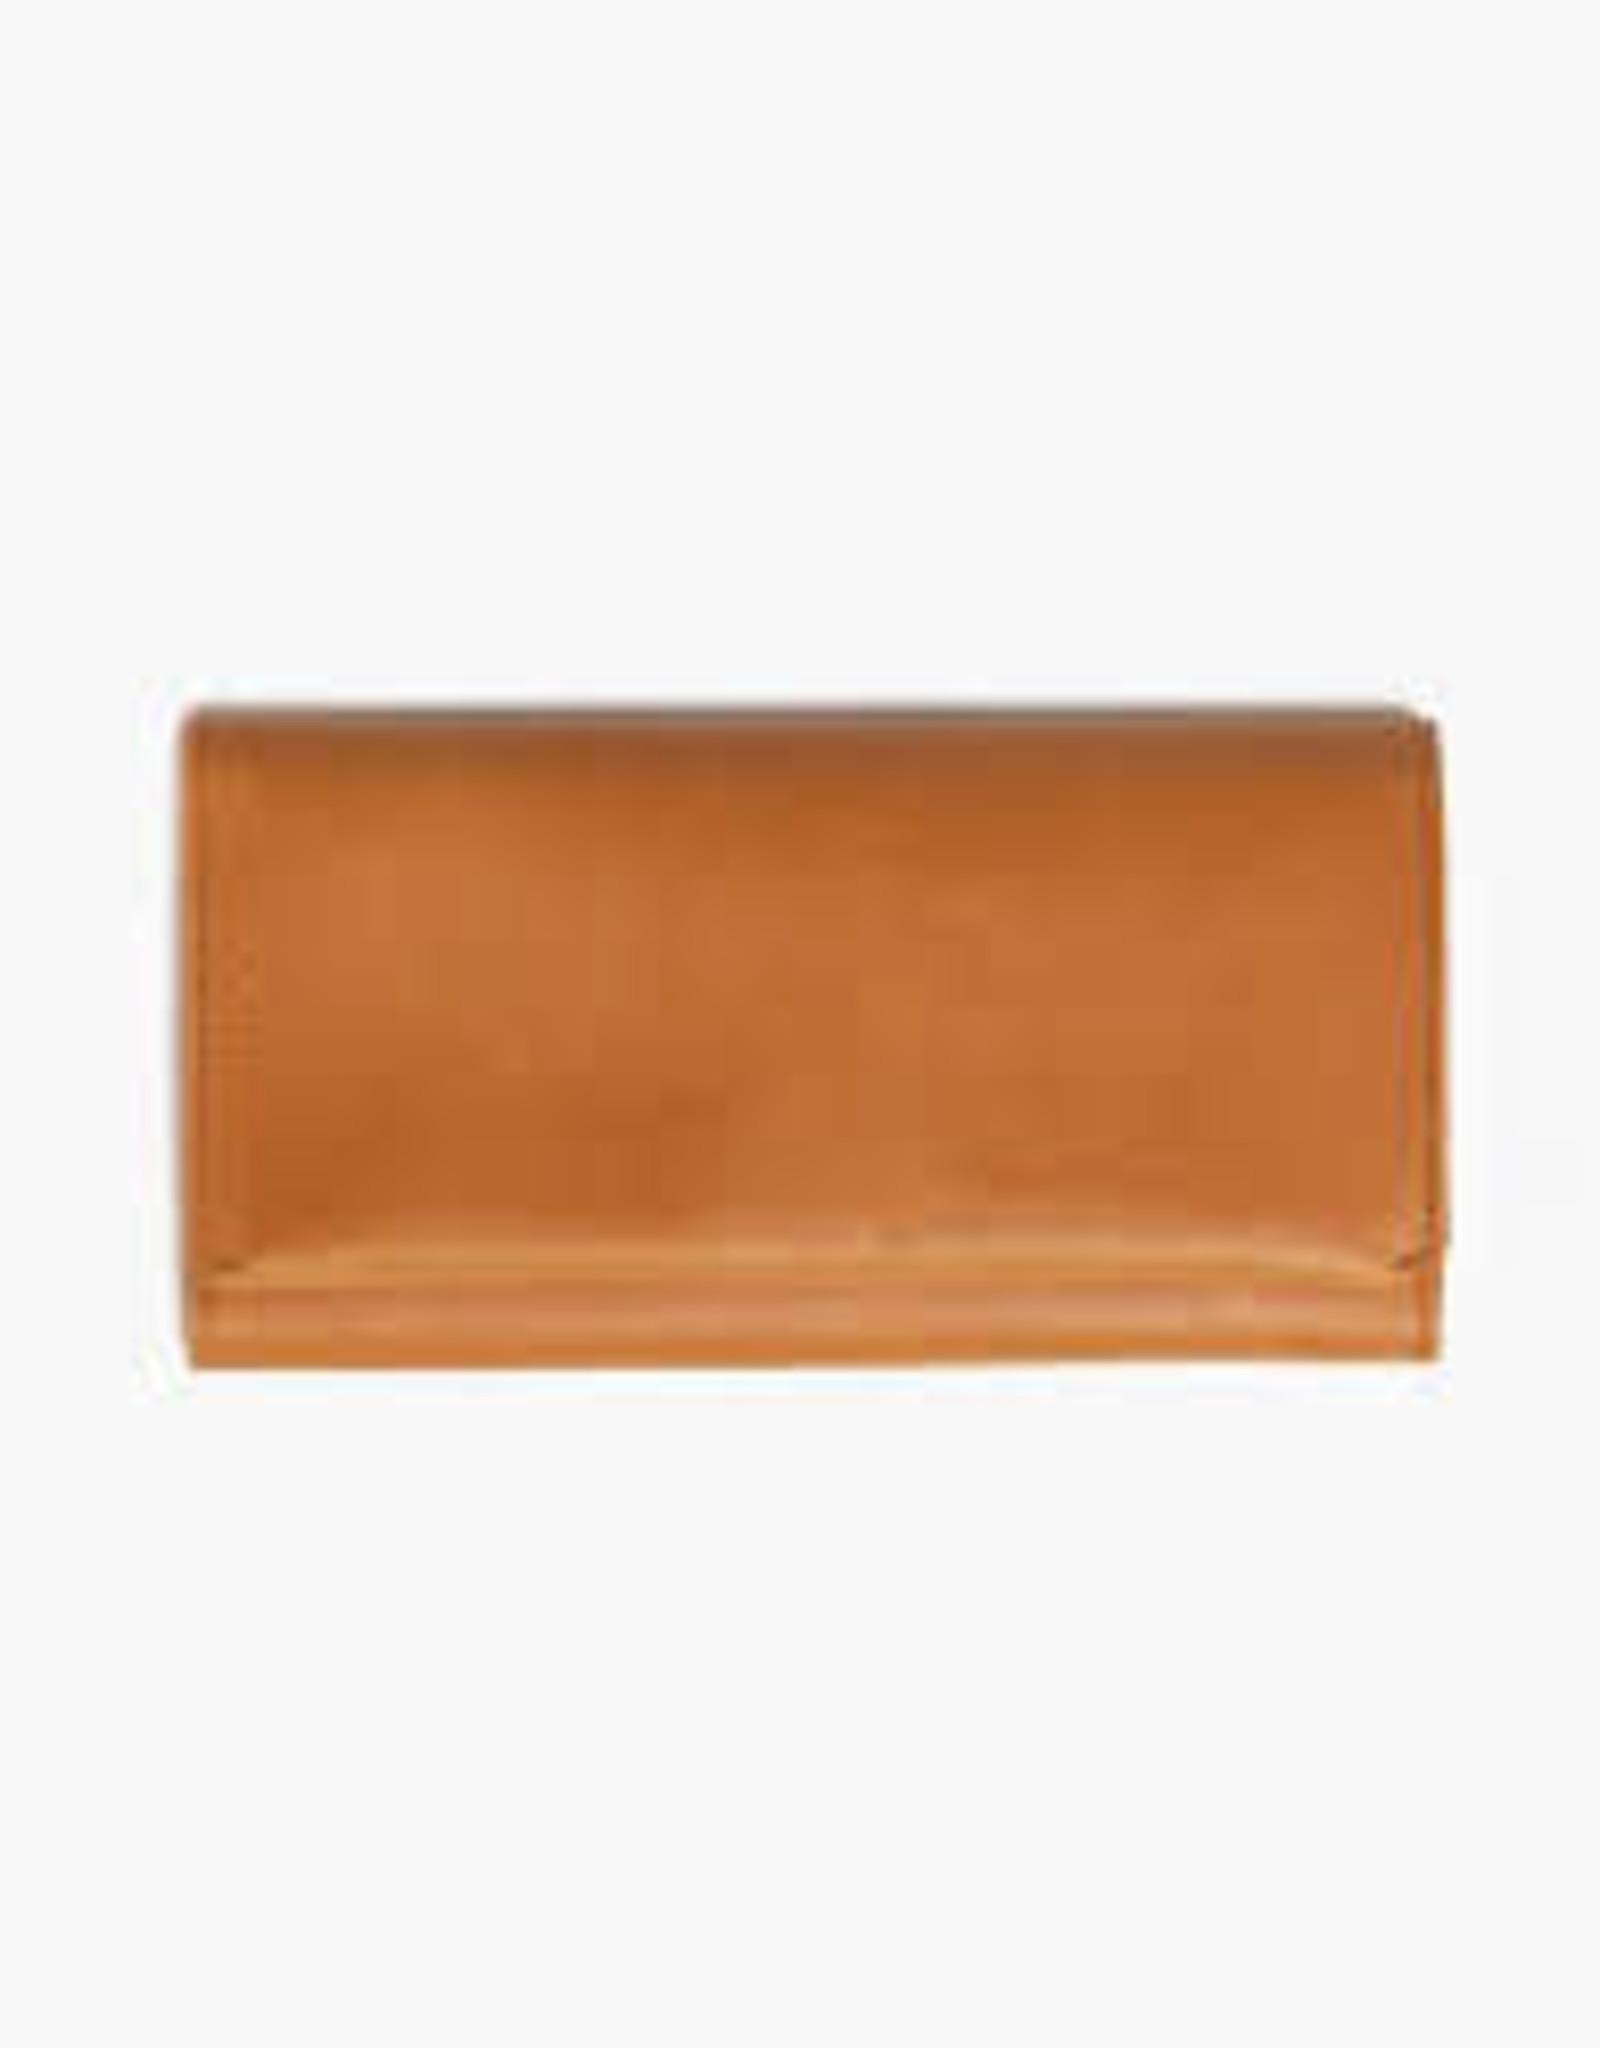 FashionABLE FashionABLE Debre Wallet